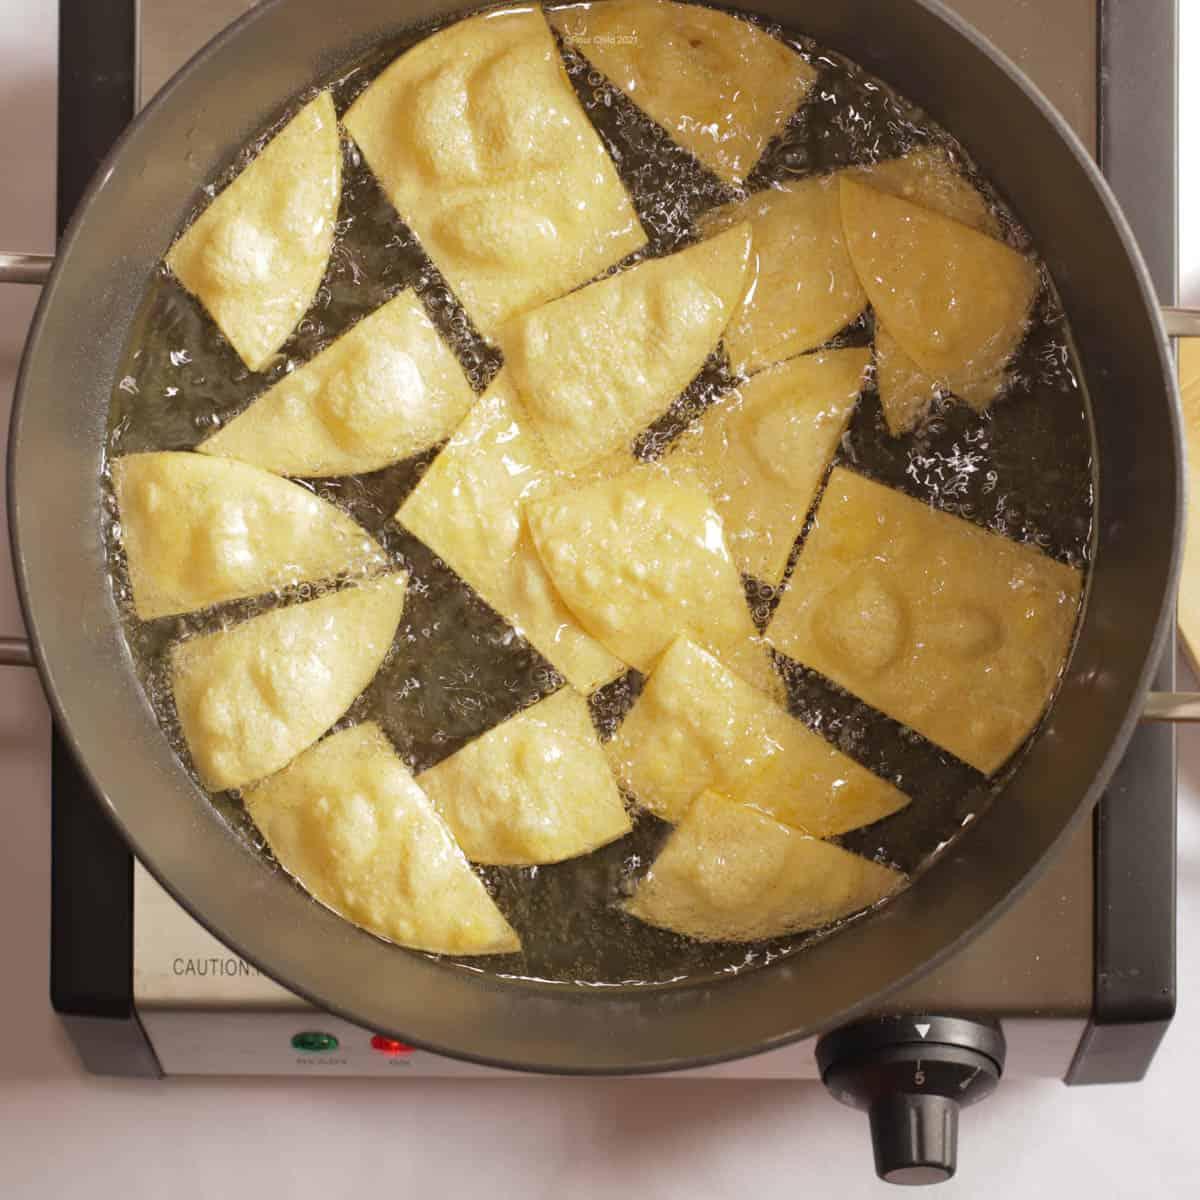 Corn tortillas frying in pan of hot oil